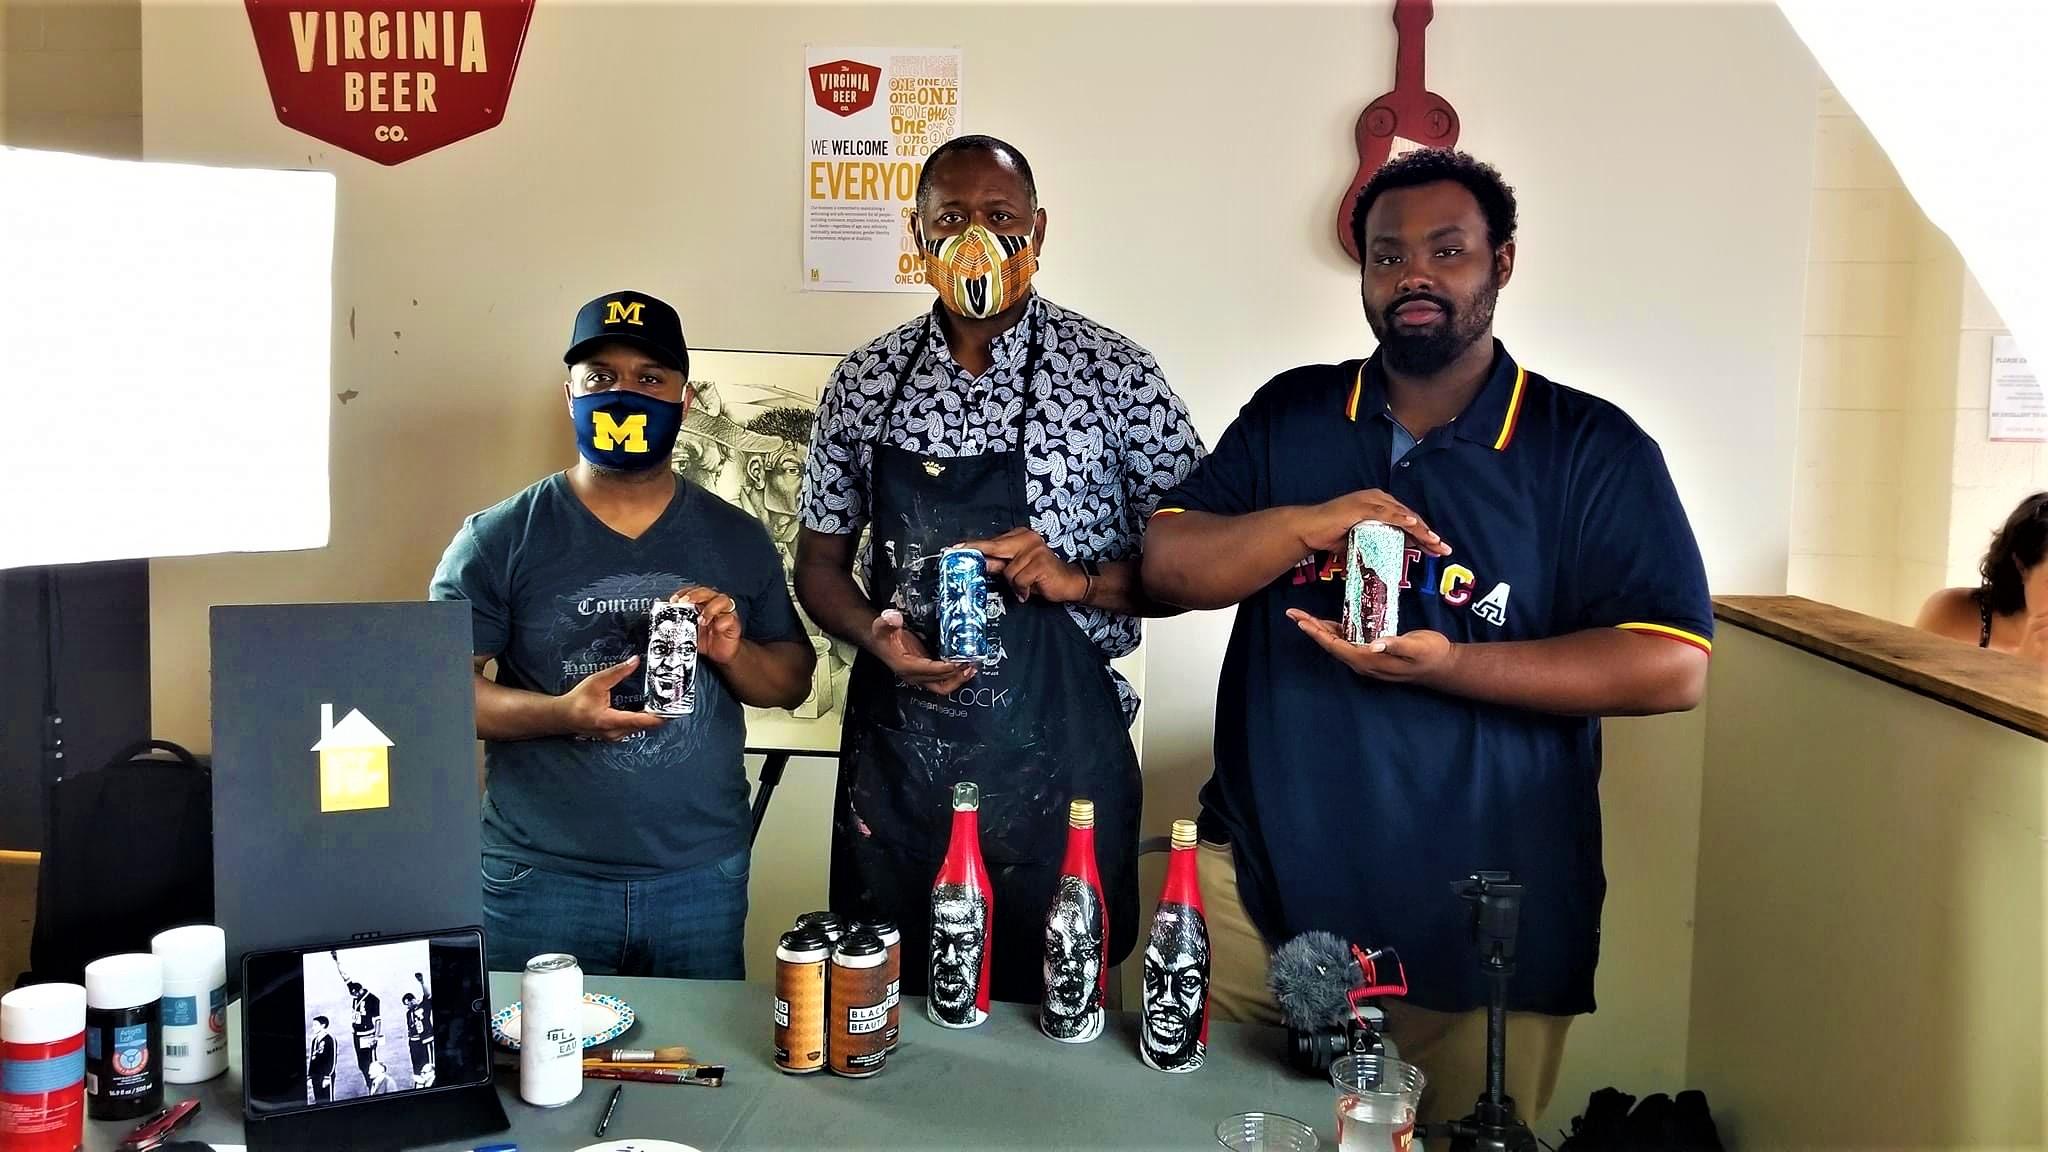 Williamsburg's Virginia Beer Co. & Media Mentors Partner For Black Is Beautiful Art Session